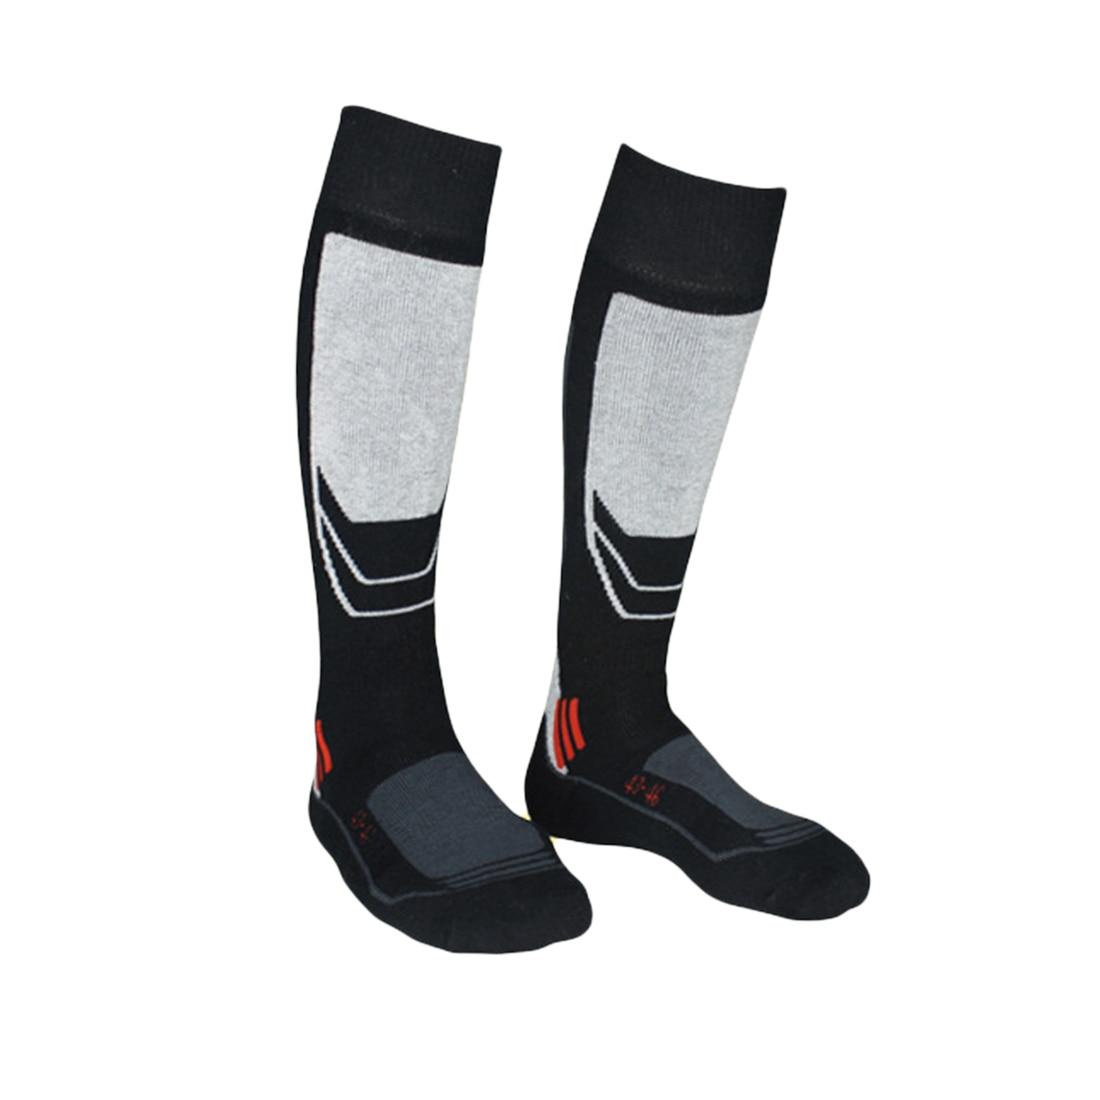 Warm Winter Men Thermal Ski Socks Thick Cotton Sports Snowboard Cycling Skiing Soccer Thermosocks Leg Warmers